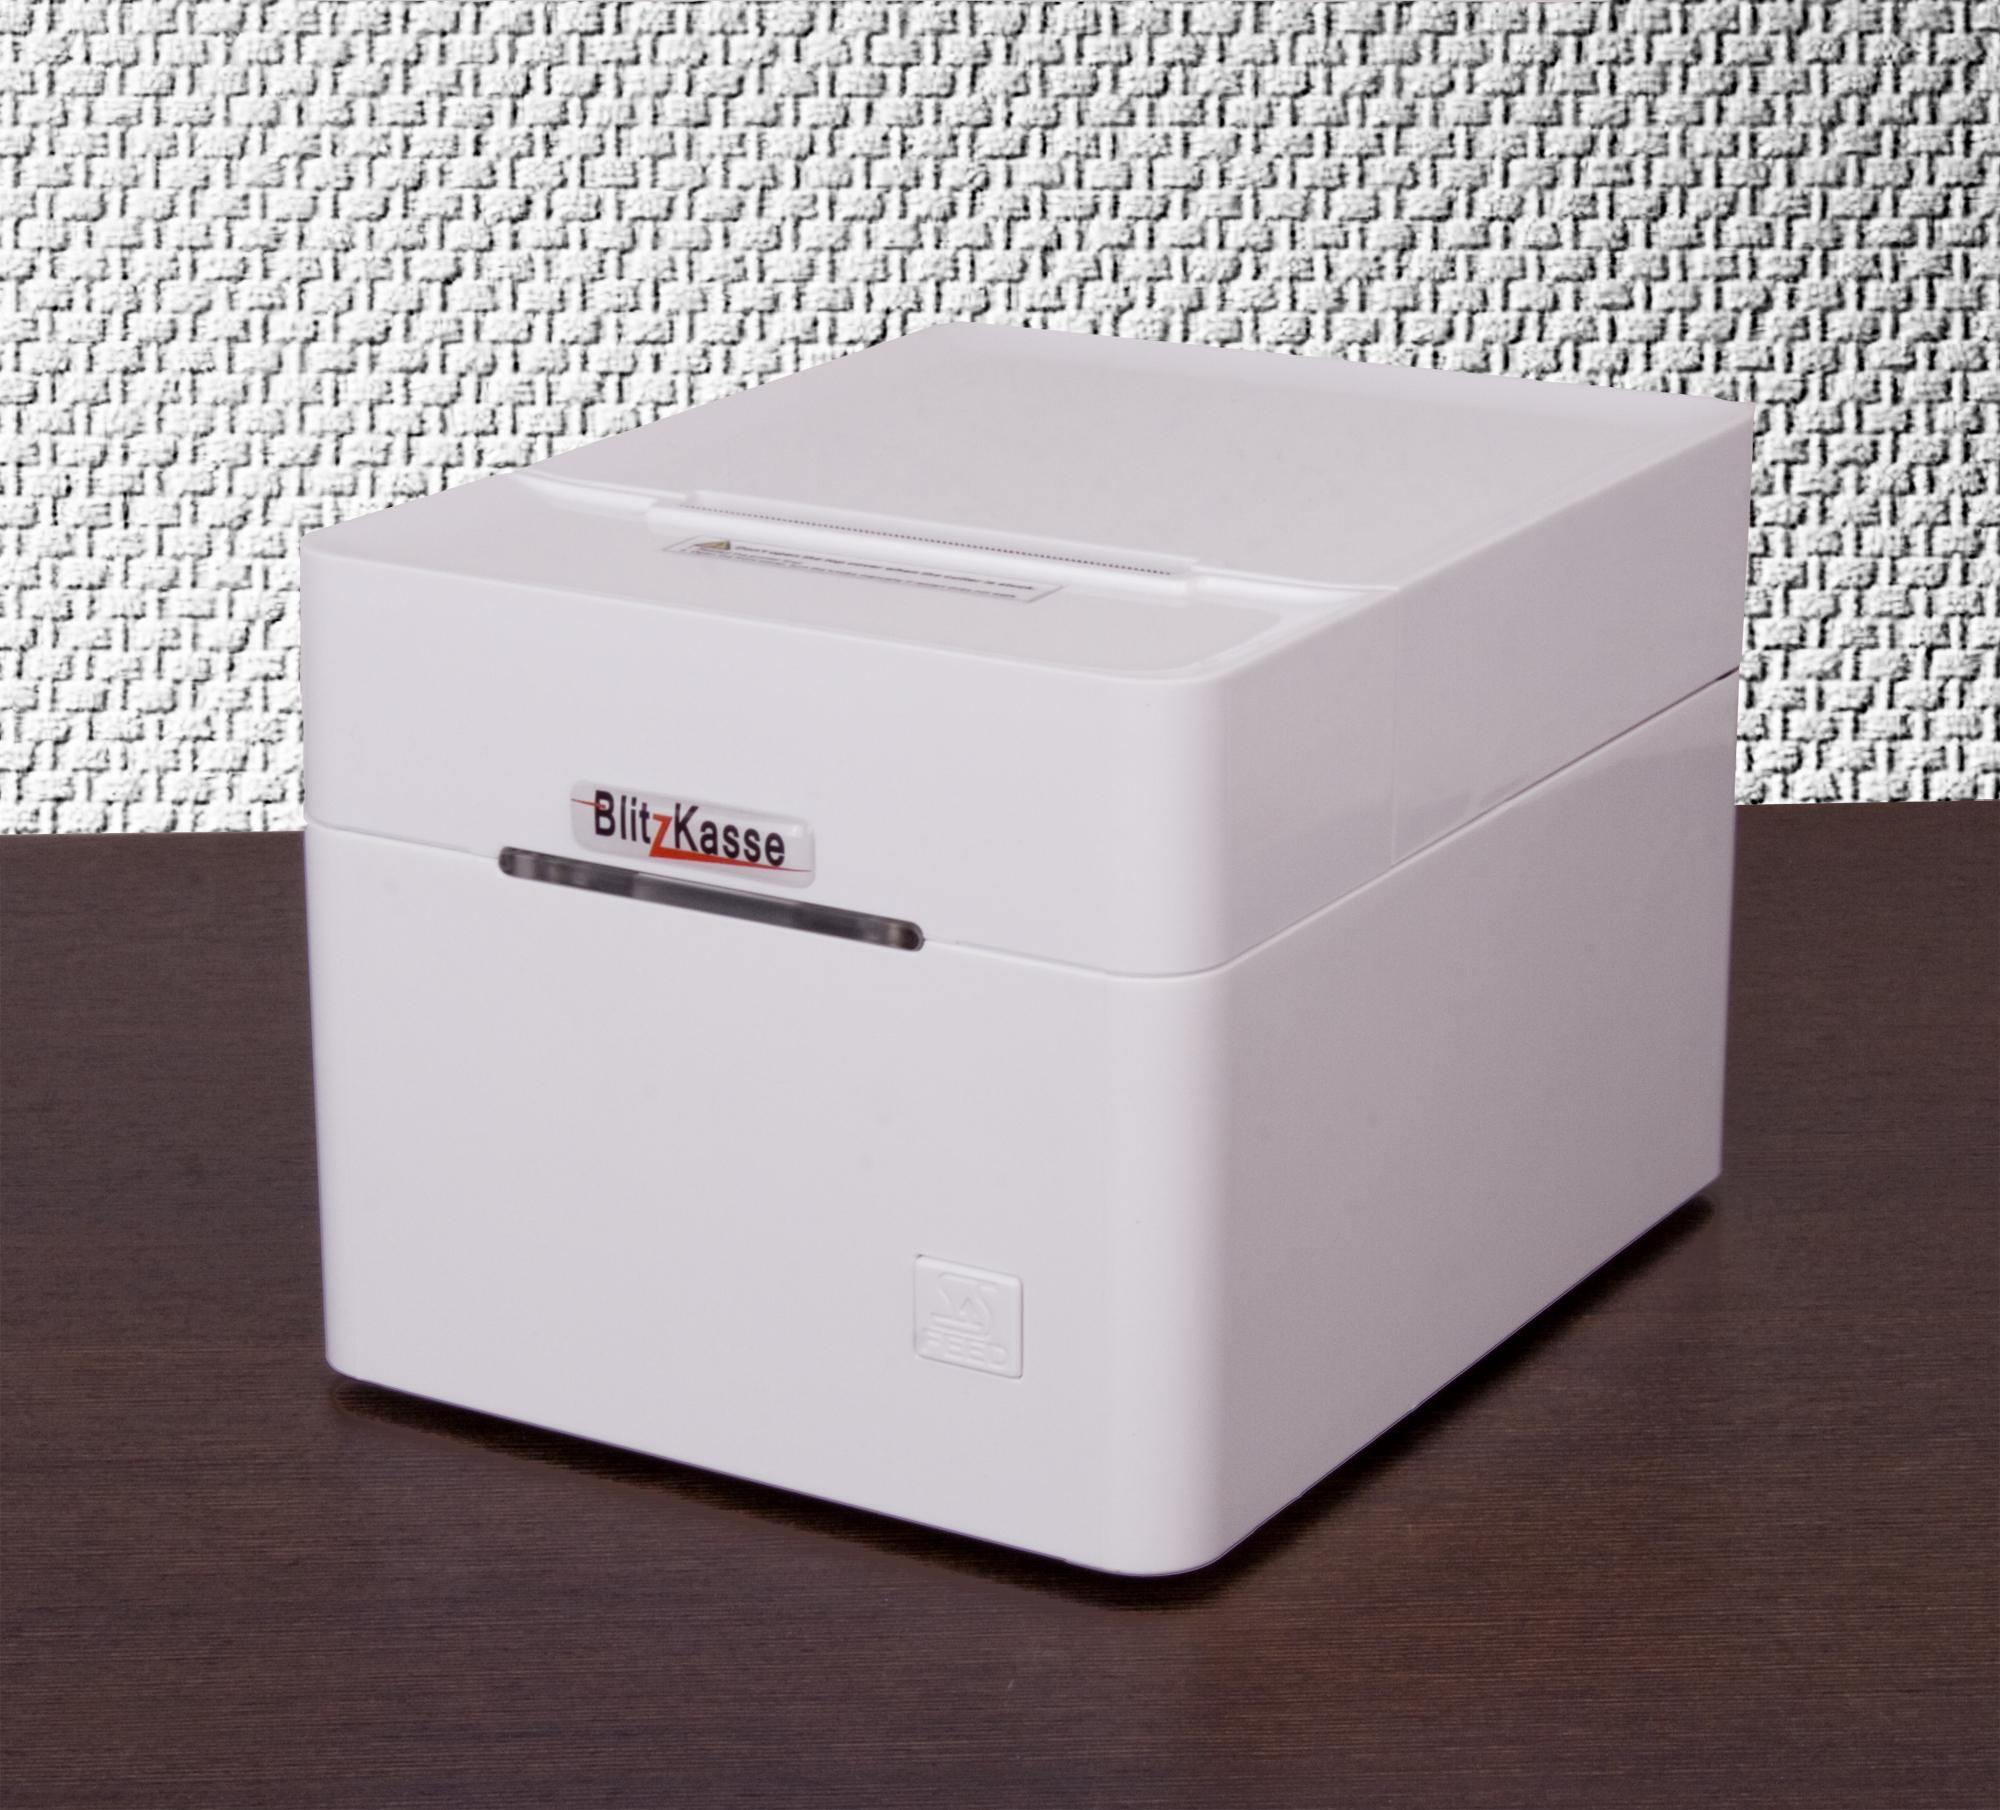 kassensystem, android, bondrucker, kasse, blitzkasse